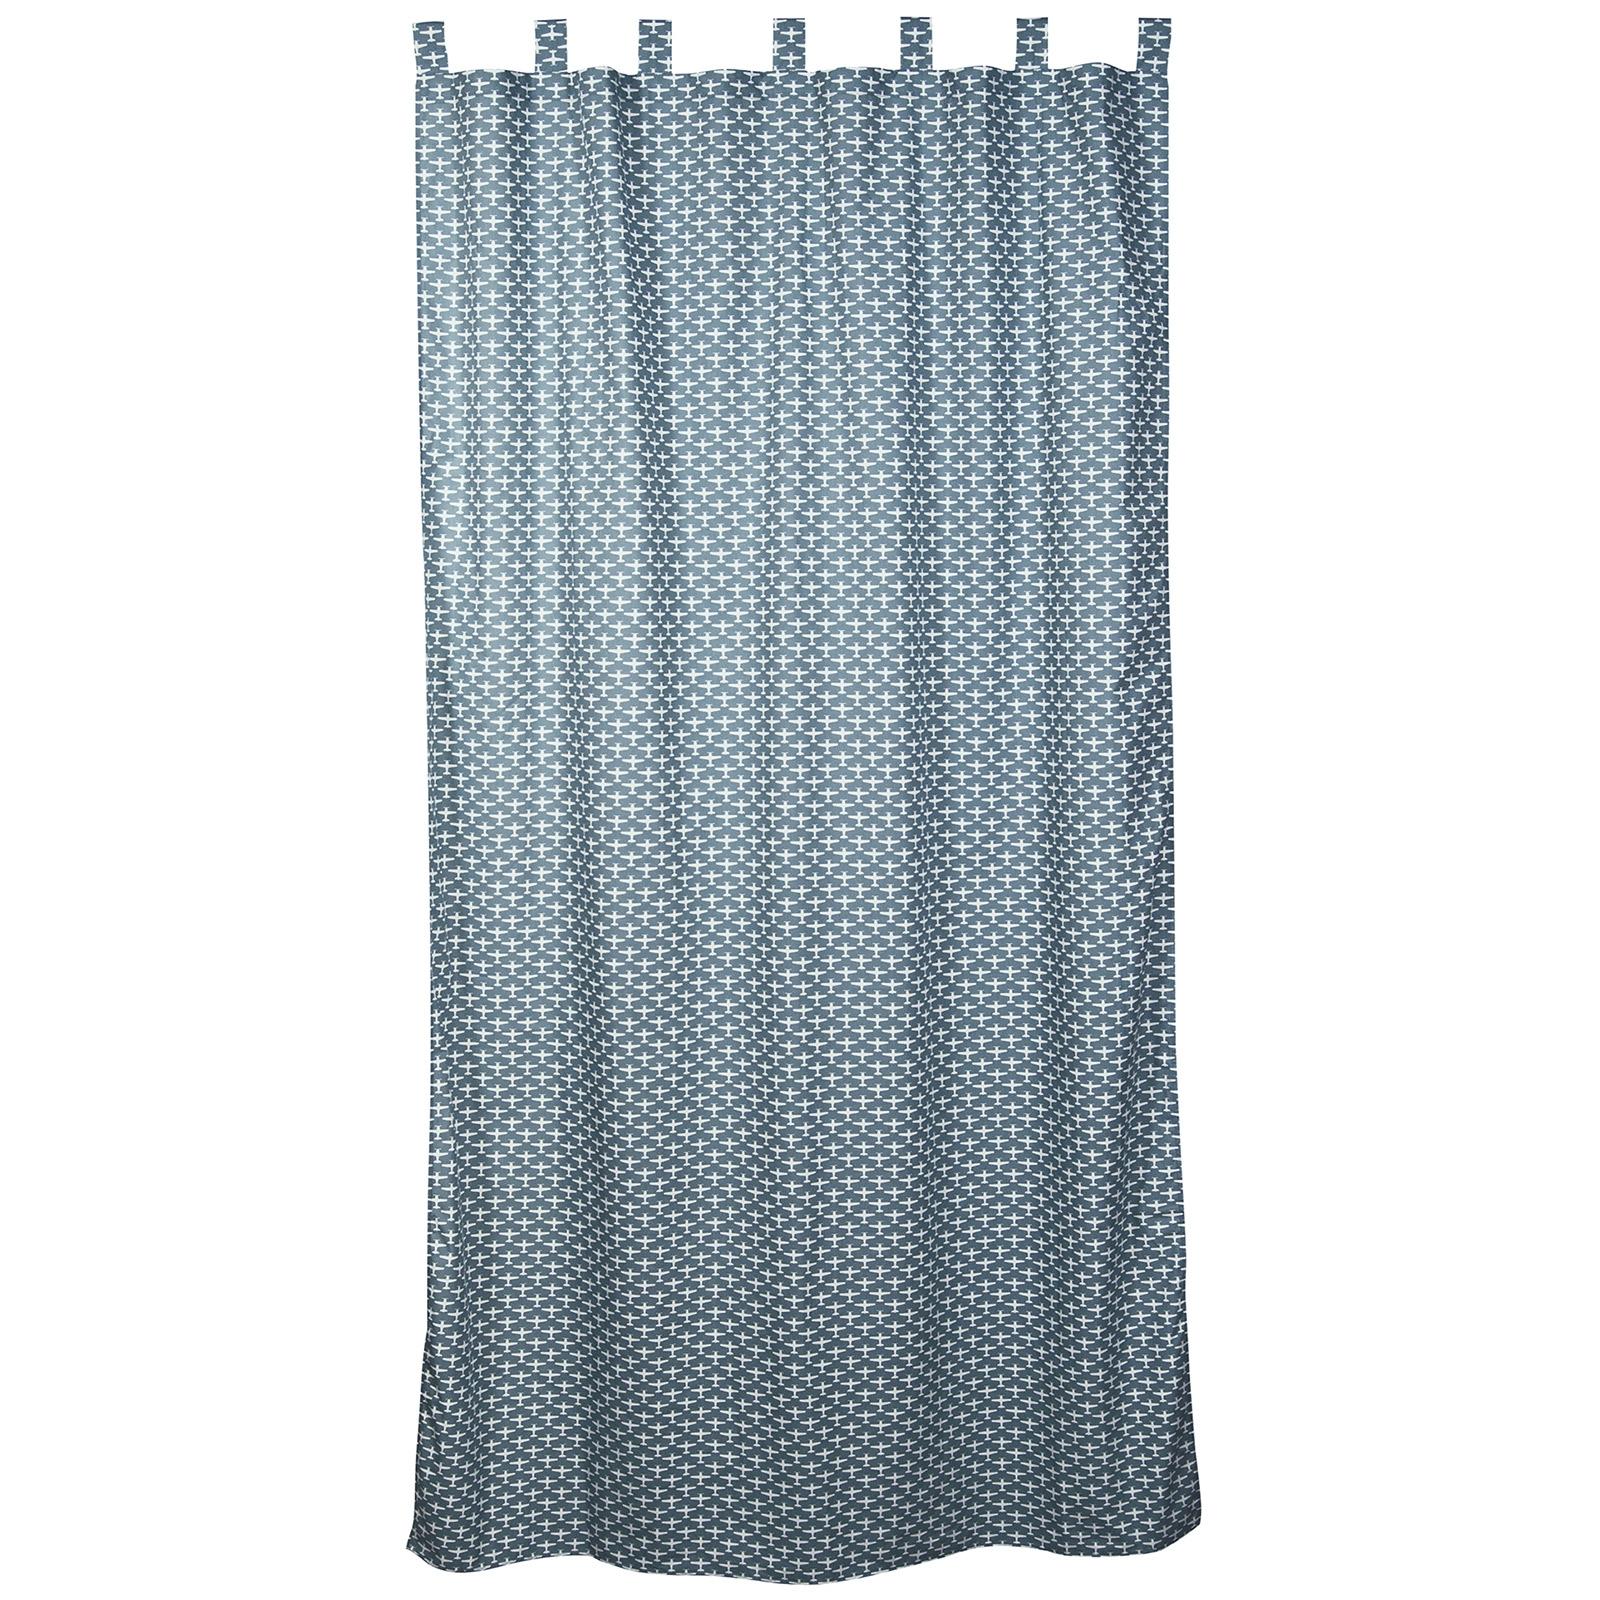 rideau bleu et gris. Black Bedroom Furniture Sets. Home Design Ideas